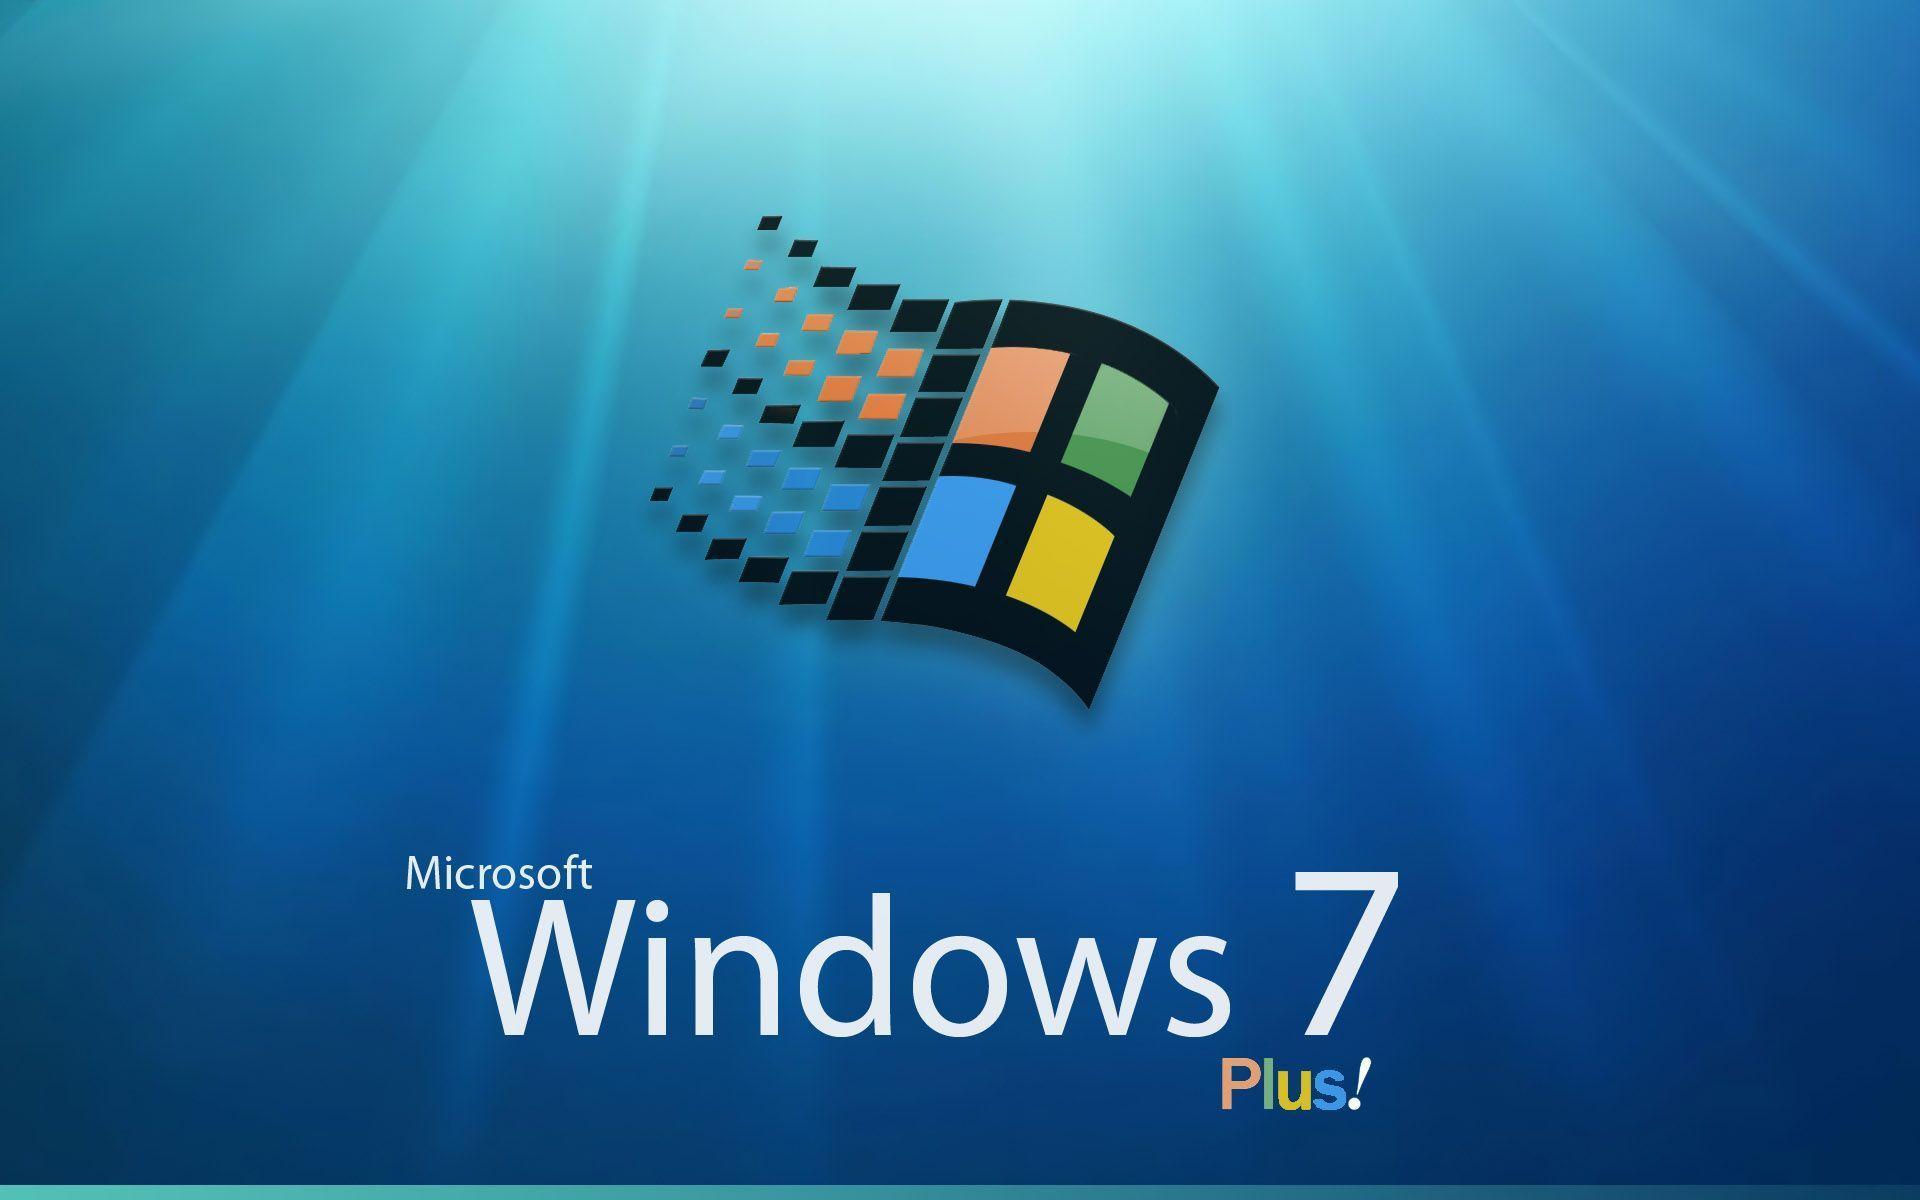 windows 98 wallpaper7 - photo #15